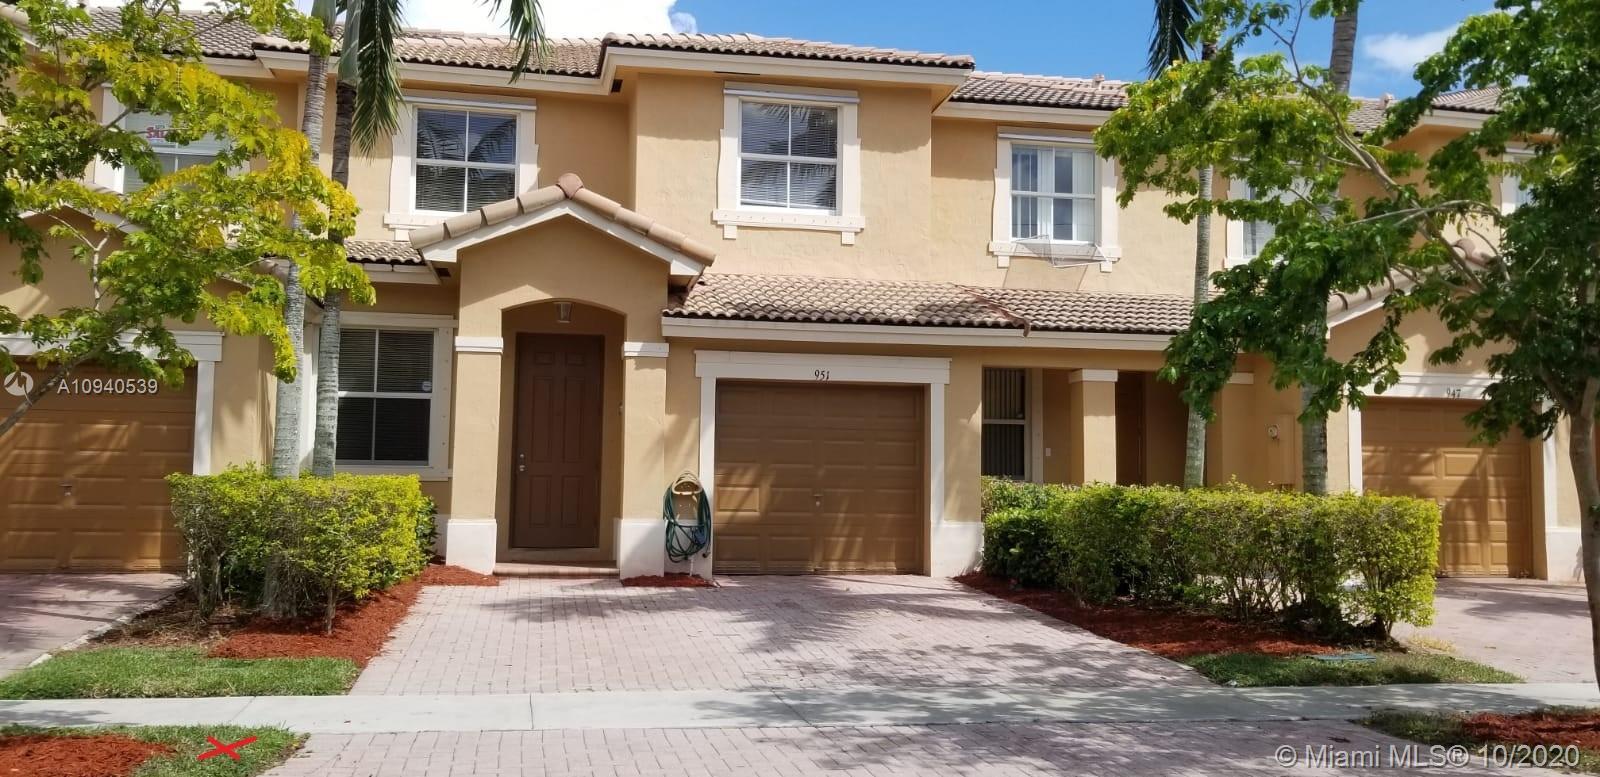 951 NE 41st Pl Property Photo - Homestead, FL real estate listing